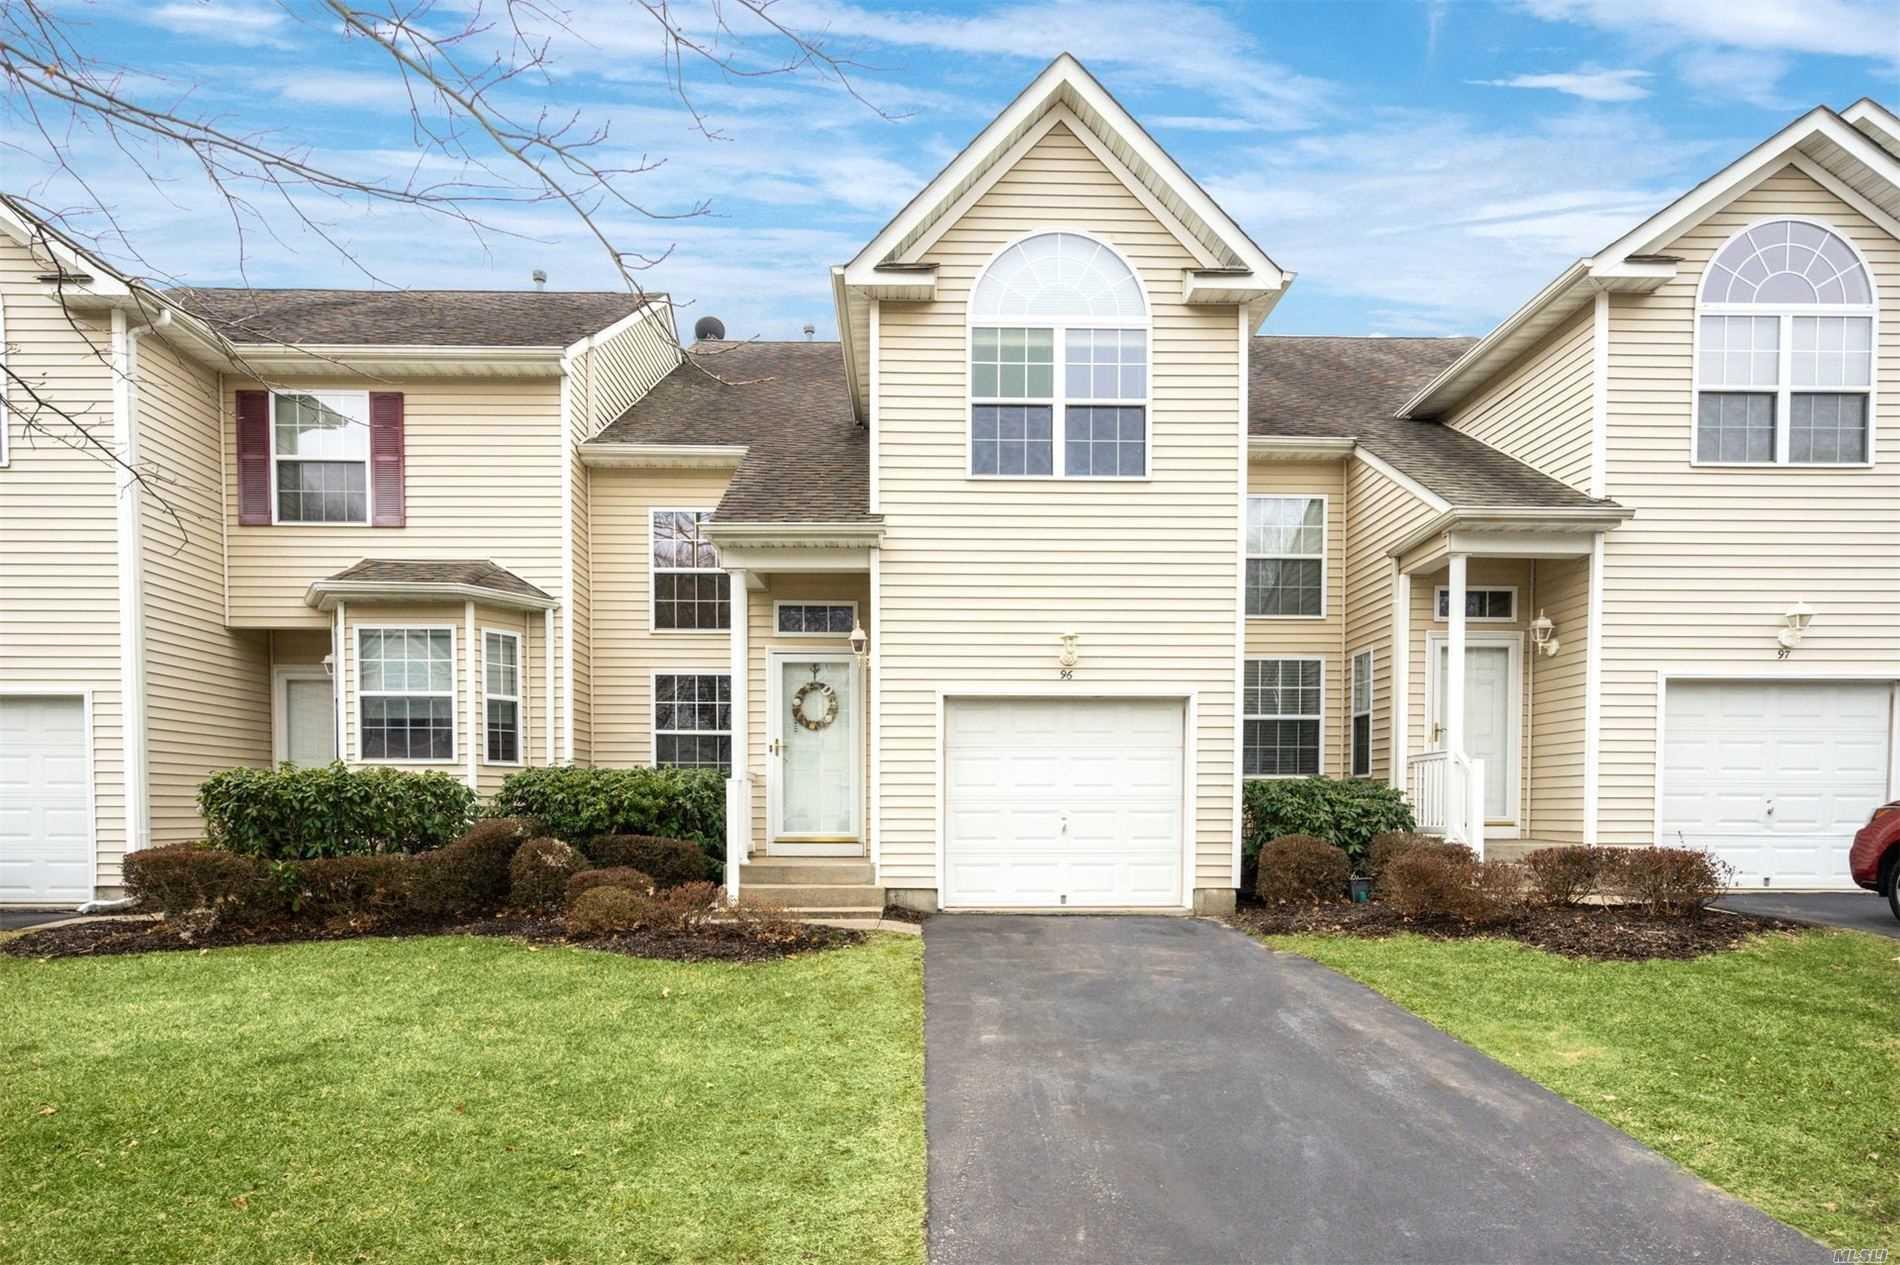 Property for sale at 96 Kettles Lane, Medford NY 11763, Medford,  New York 11763